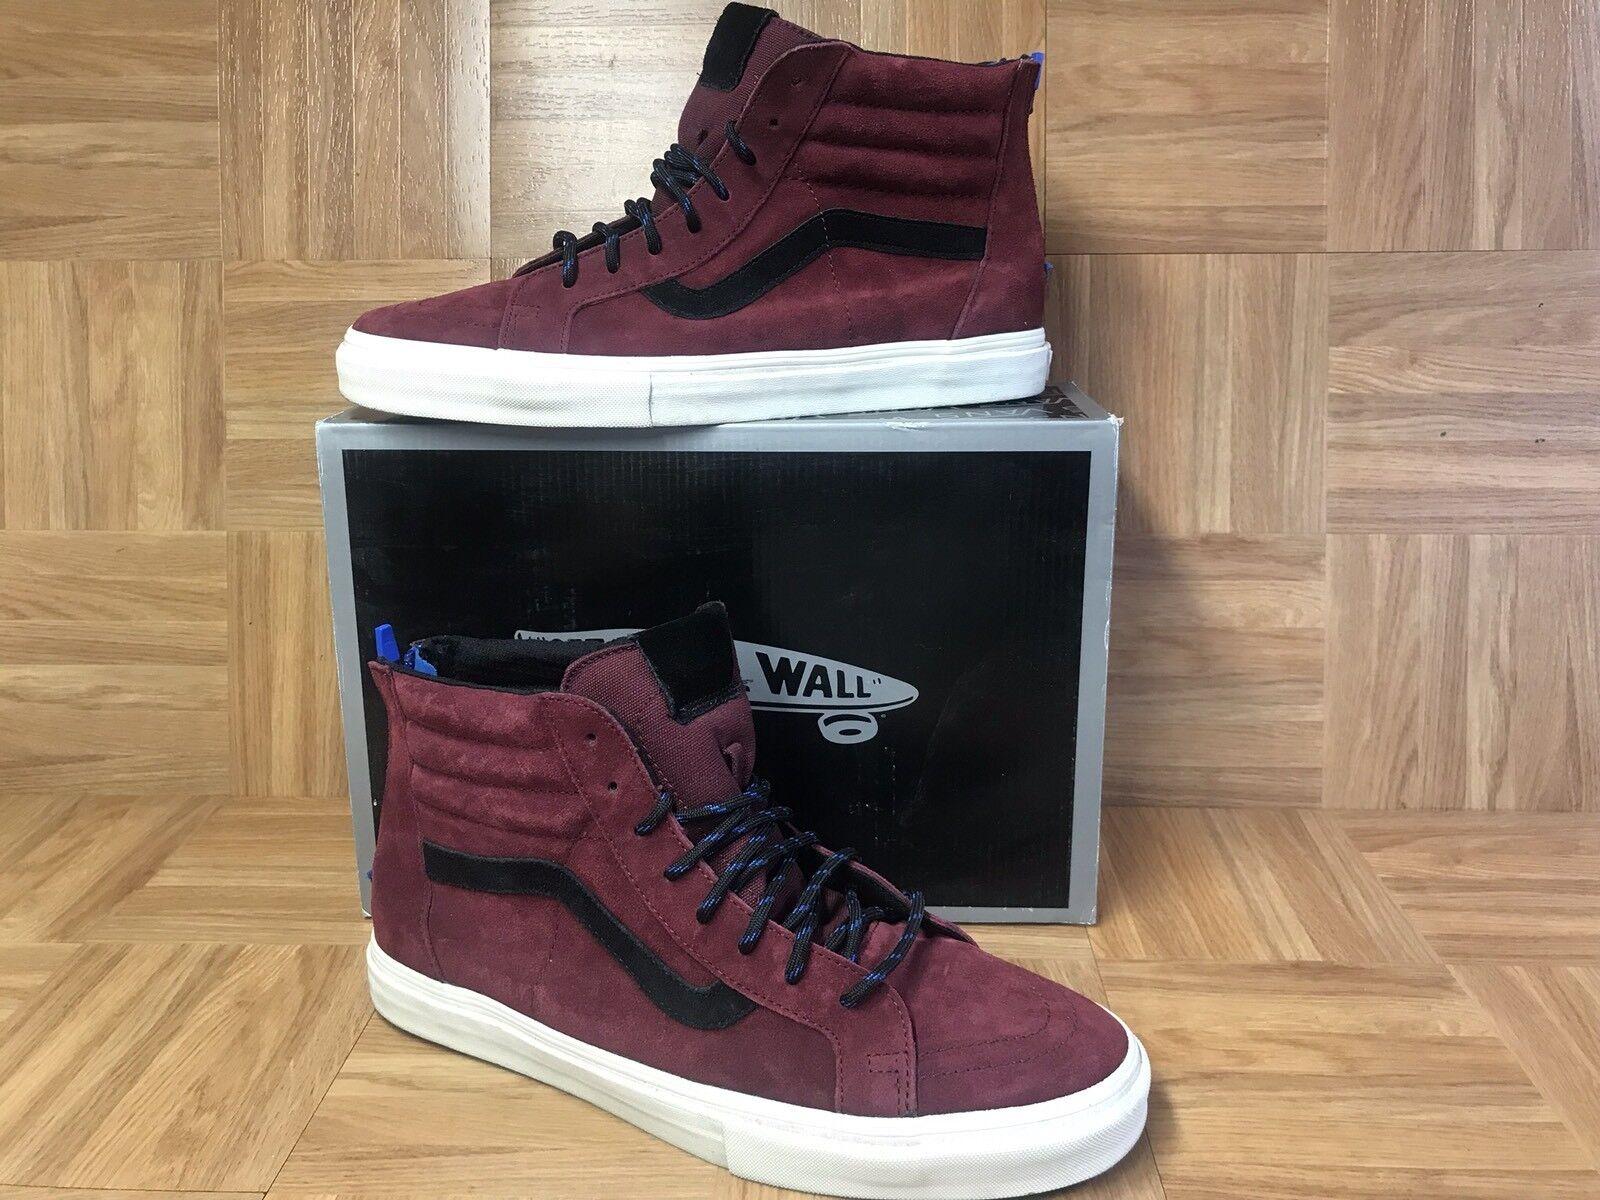 RARE� VANS Sk8-Hi Vault Zip LX Premier Suede Dark Shadow 13 Skateboarding Shoes